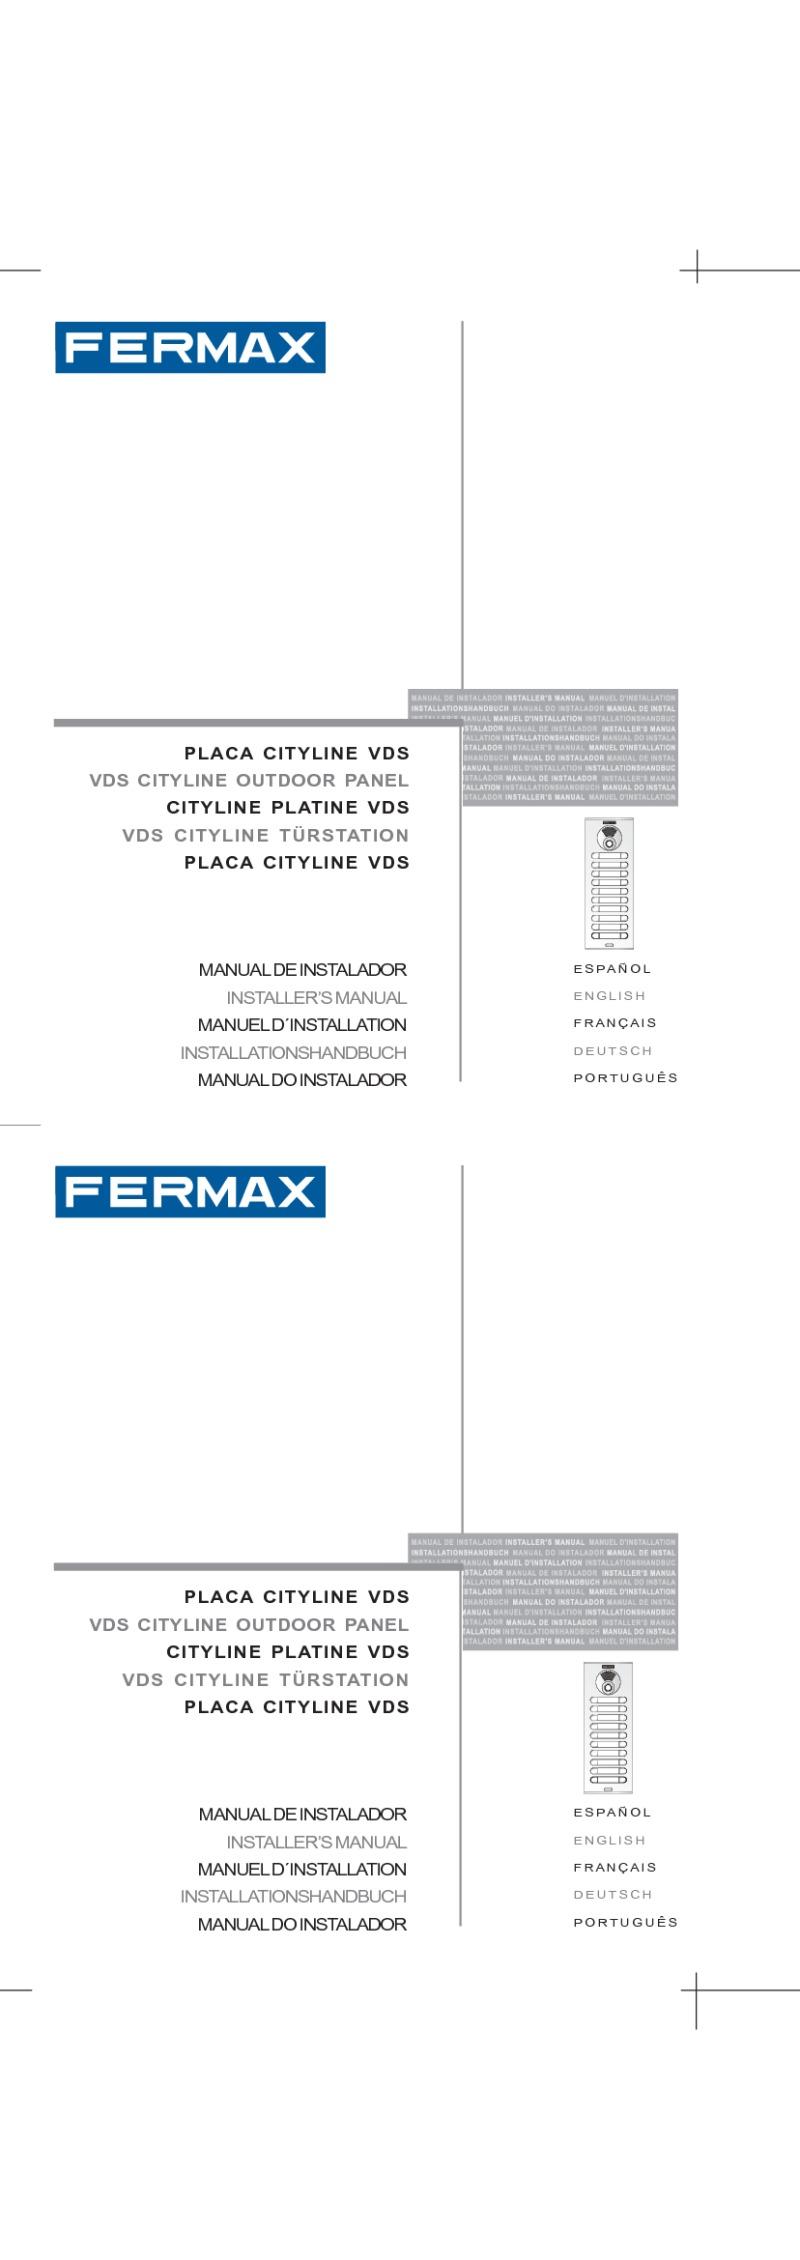 fermax installation instructions rh doorentrydirect com 3-Way Switch Wiring Diagram Wired UK